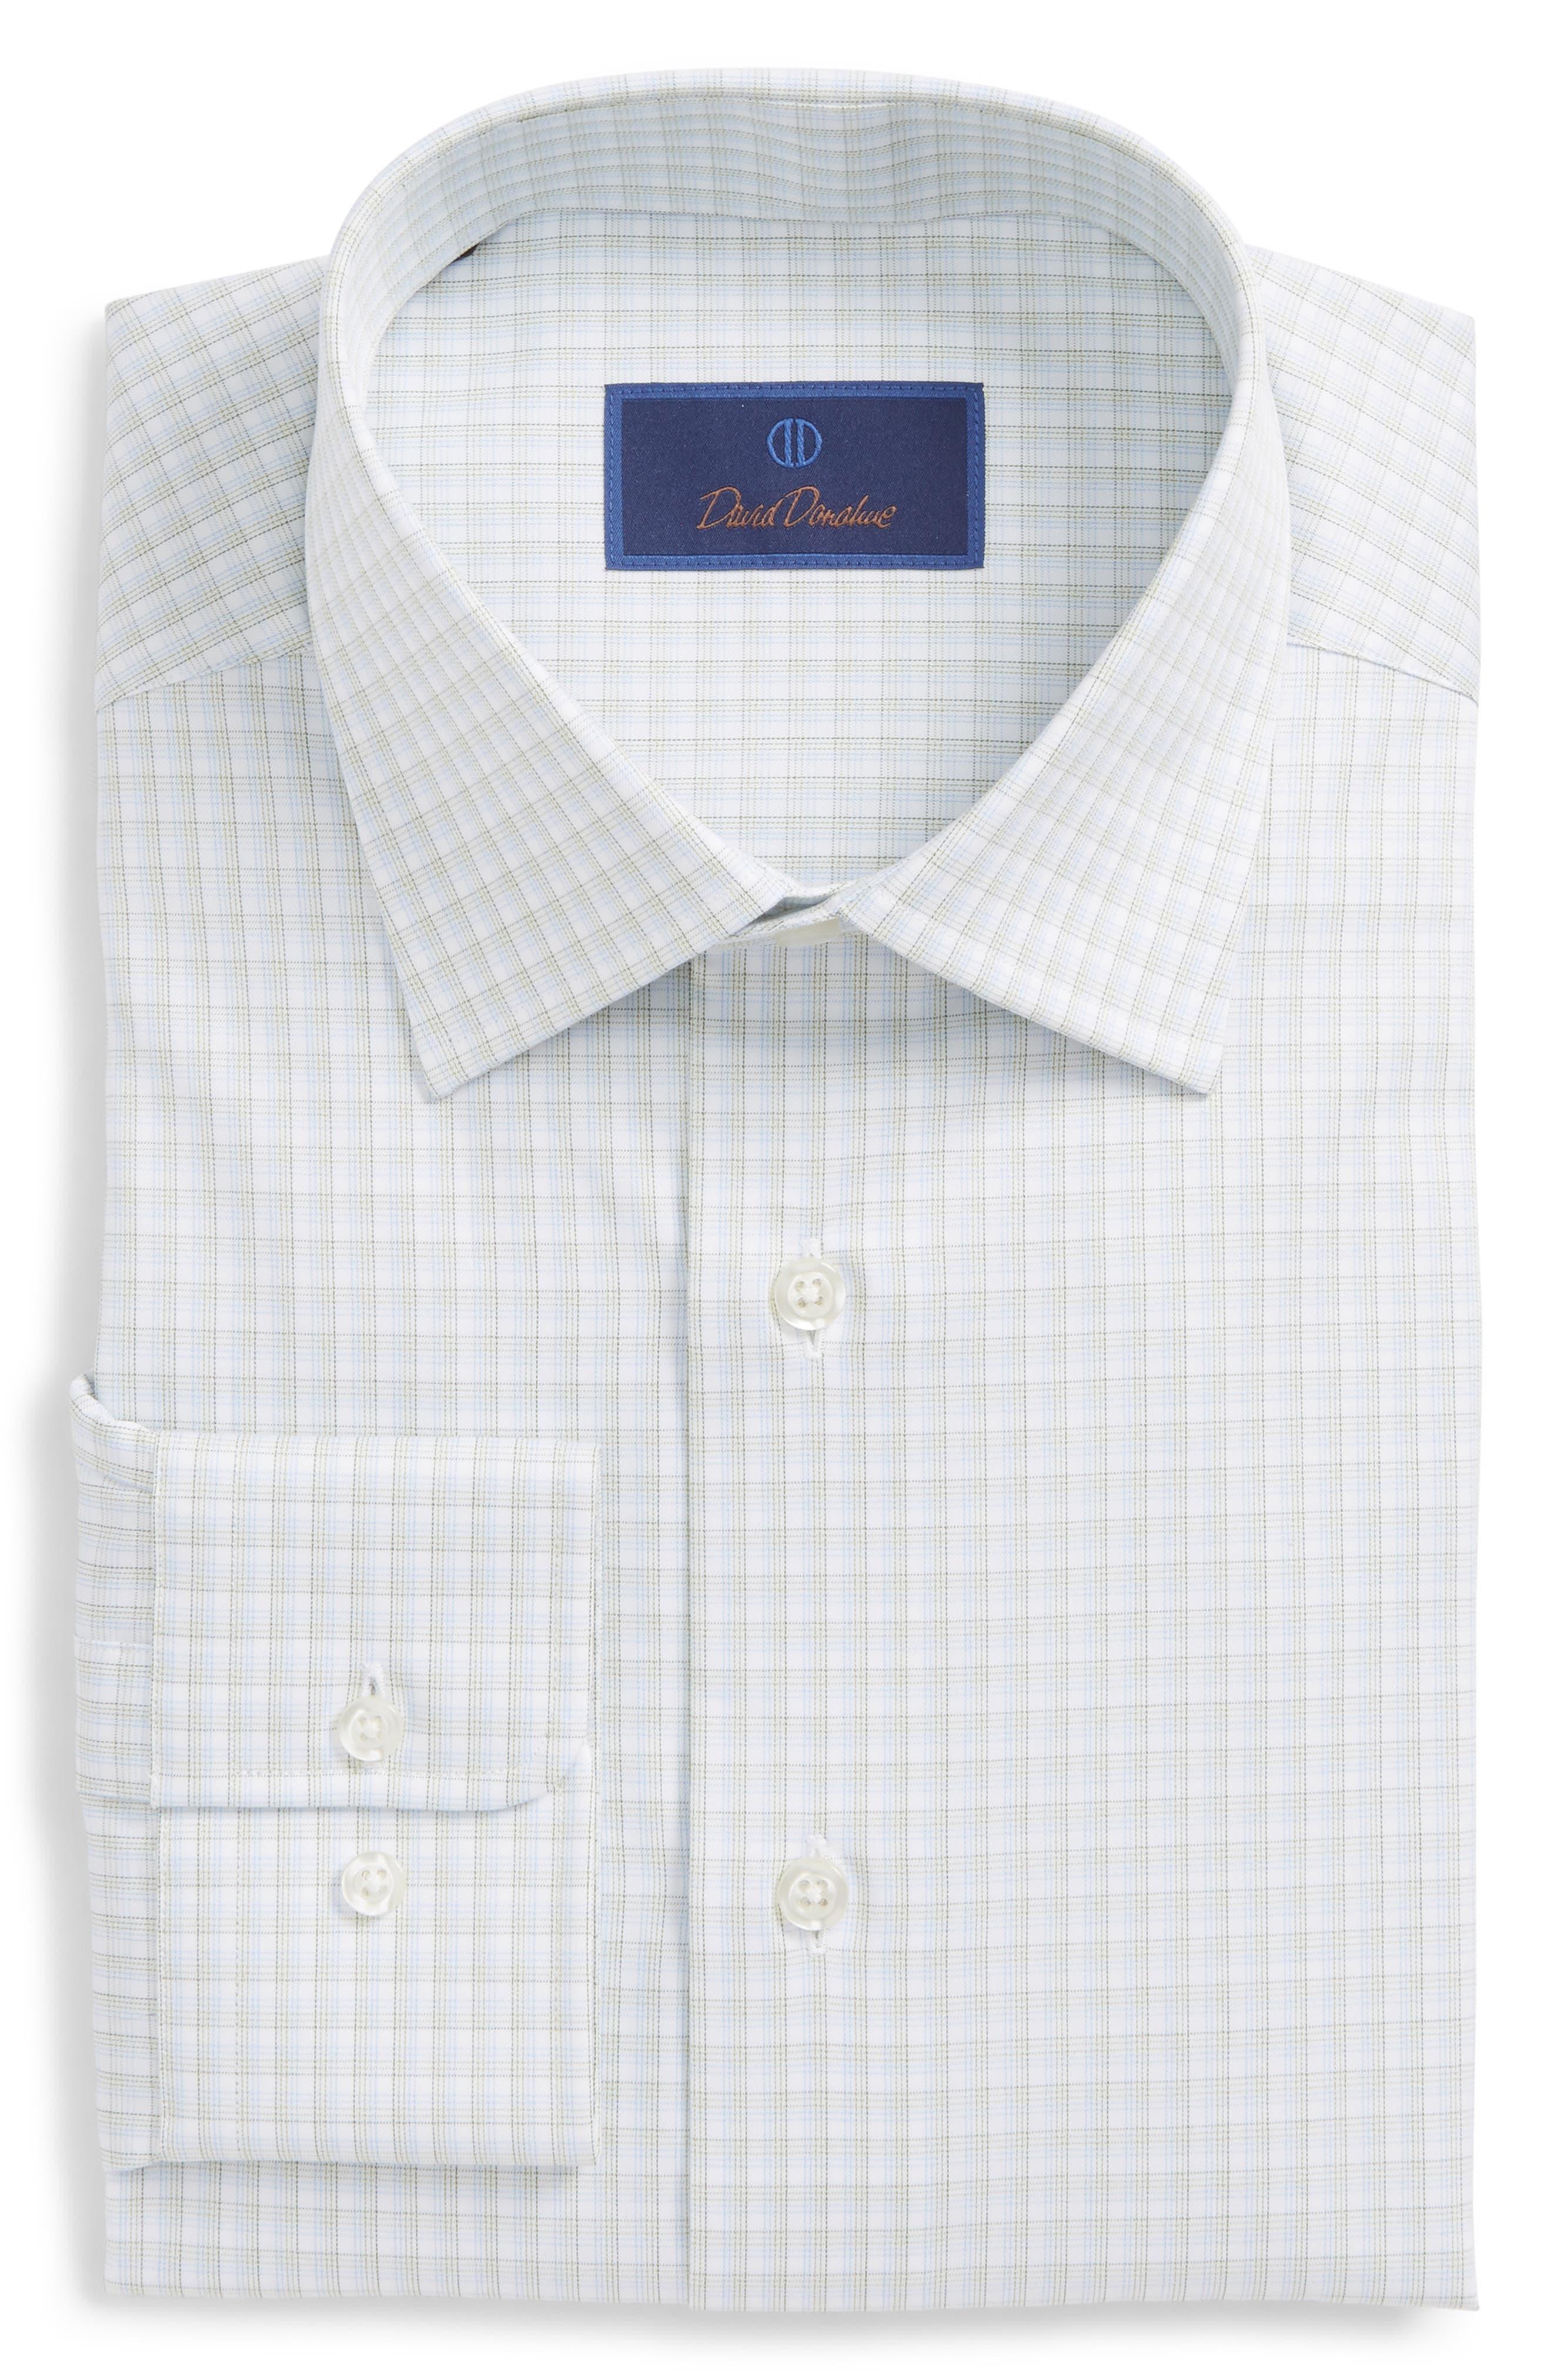 Regular Fit Check Dress Shirt,                         Main,                         color, 310